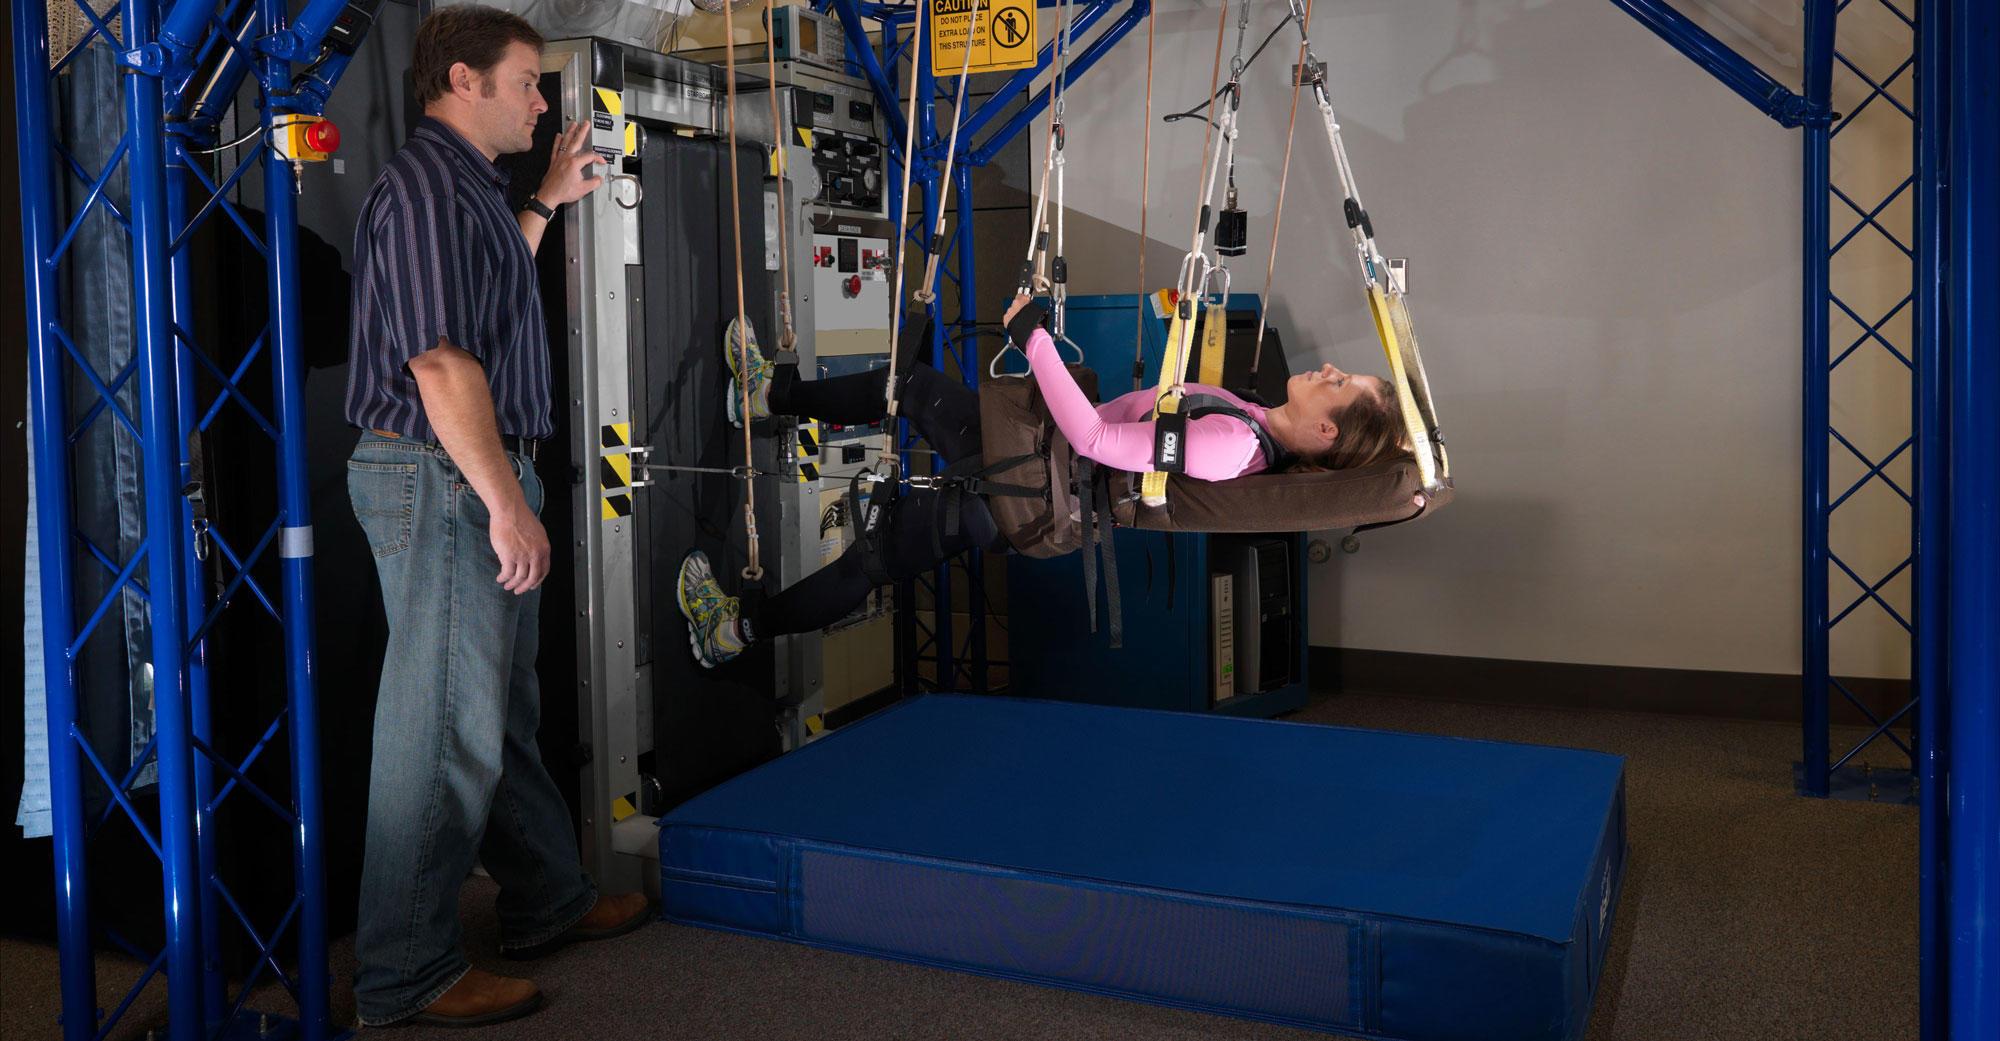 I Sprint For Exercise: NASA's iRAT Study